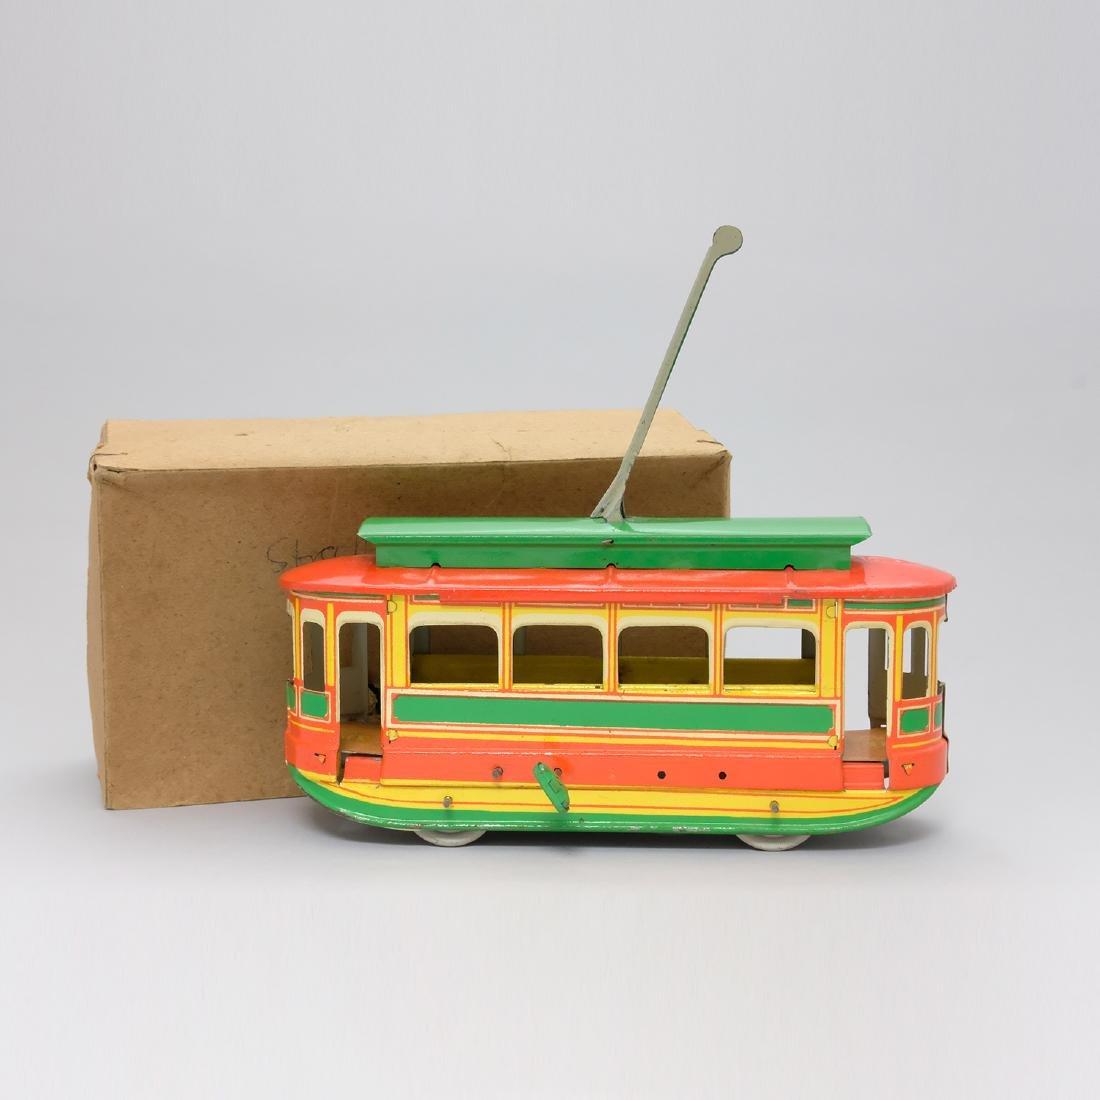 Strabenbabn Trolley with Box